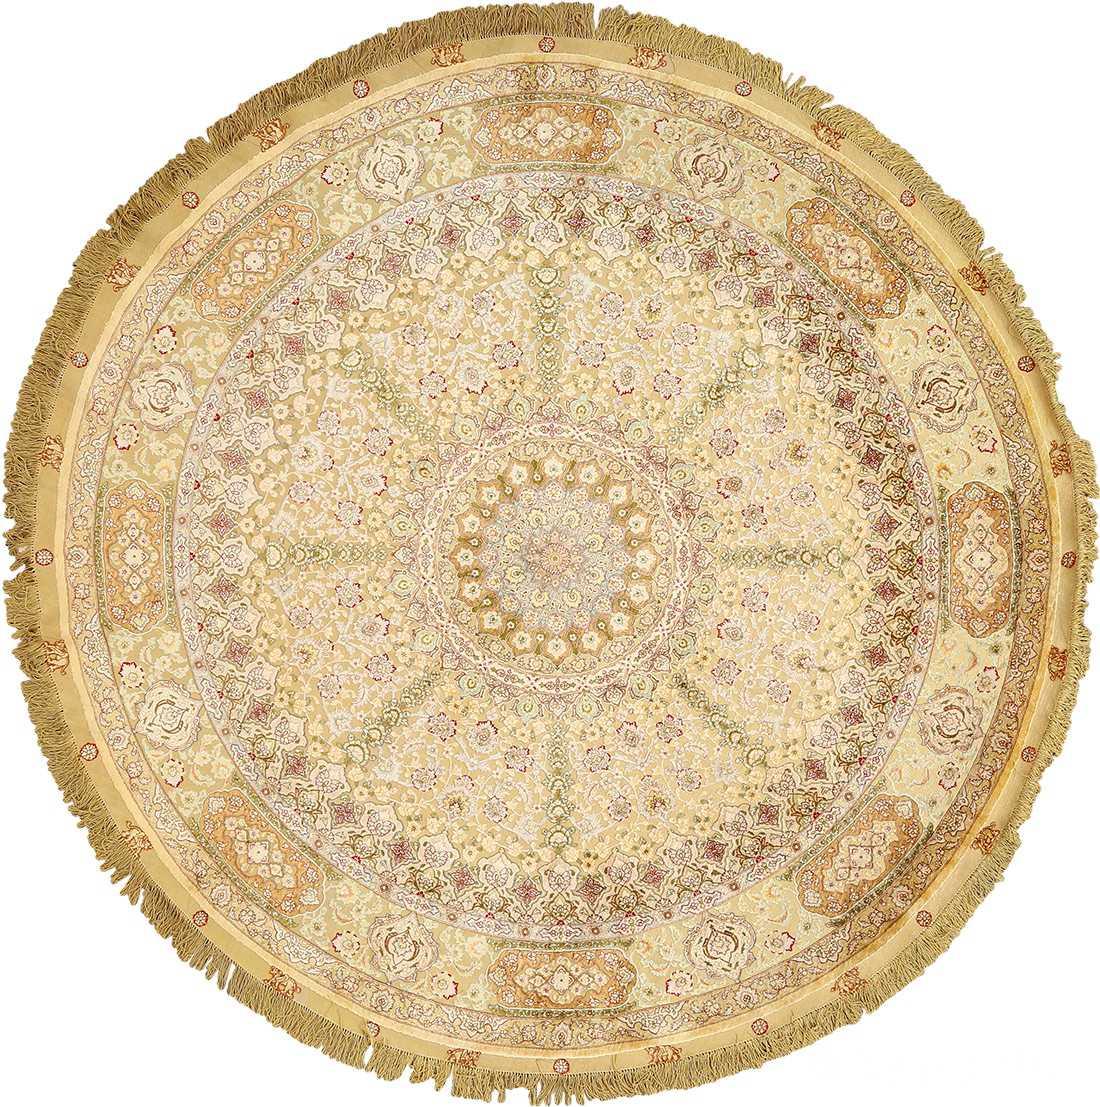 Modern Persian Tabriz Design Rug 44687 Nazmiyal Antique Rugs: Magnificent Round Vintage Tabriz Persian Rug 51130 By Nazmiyal